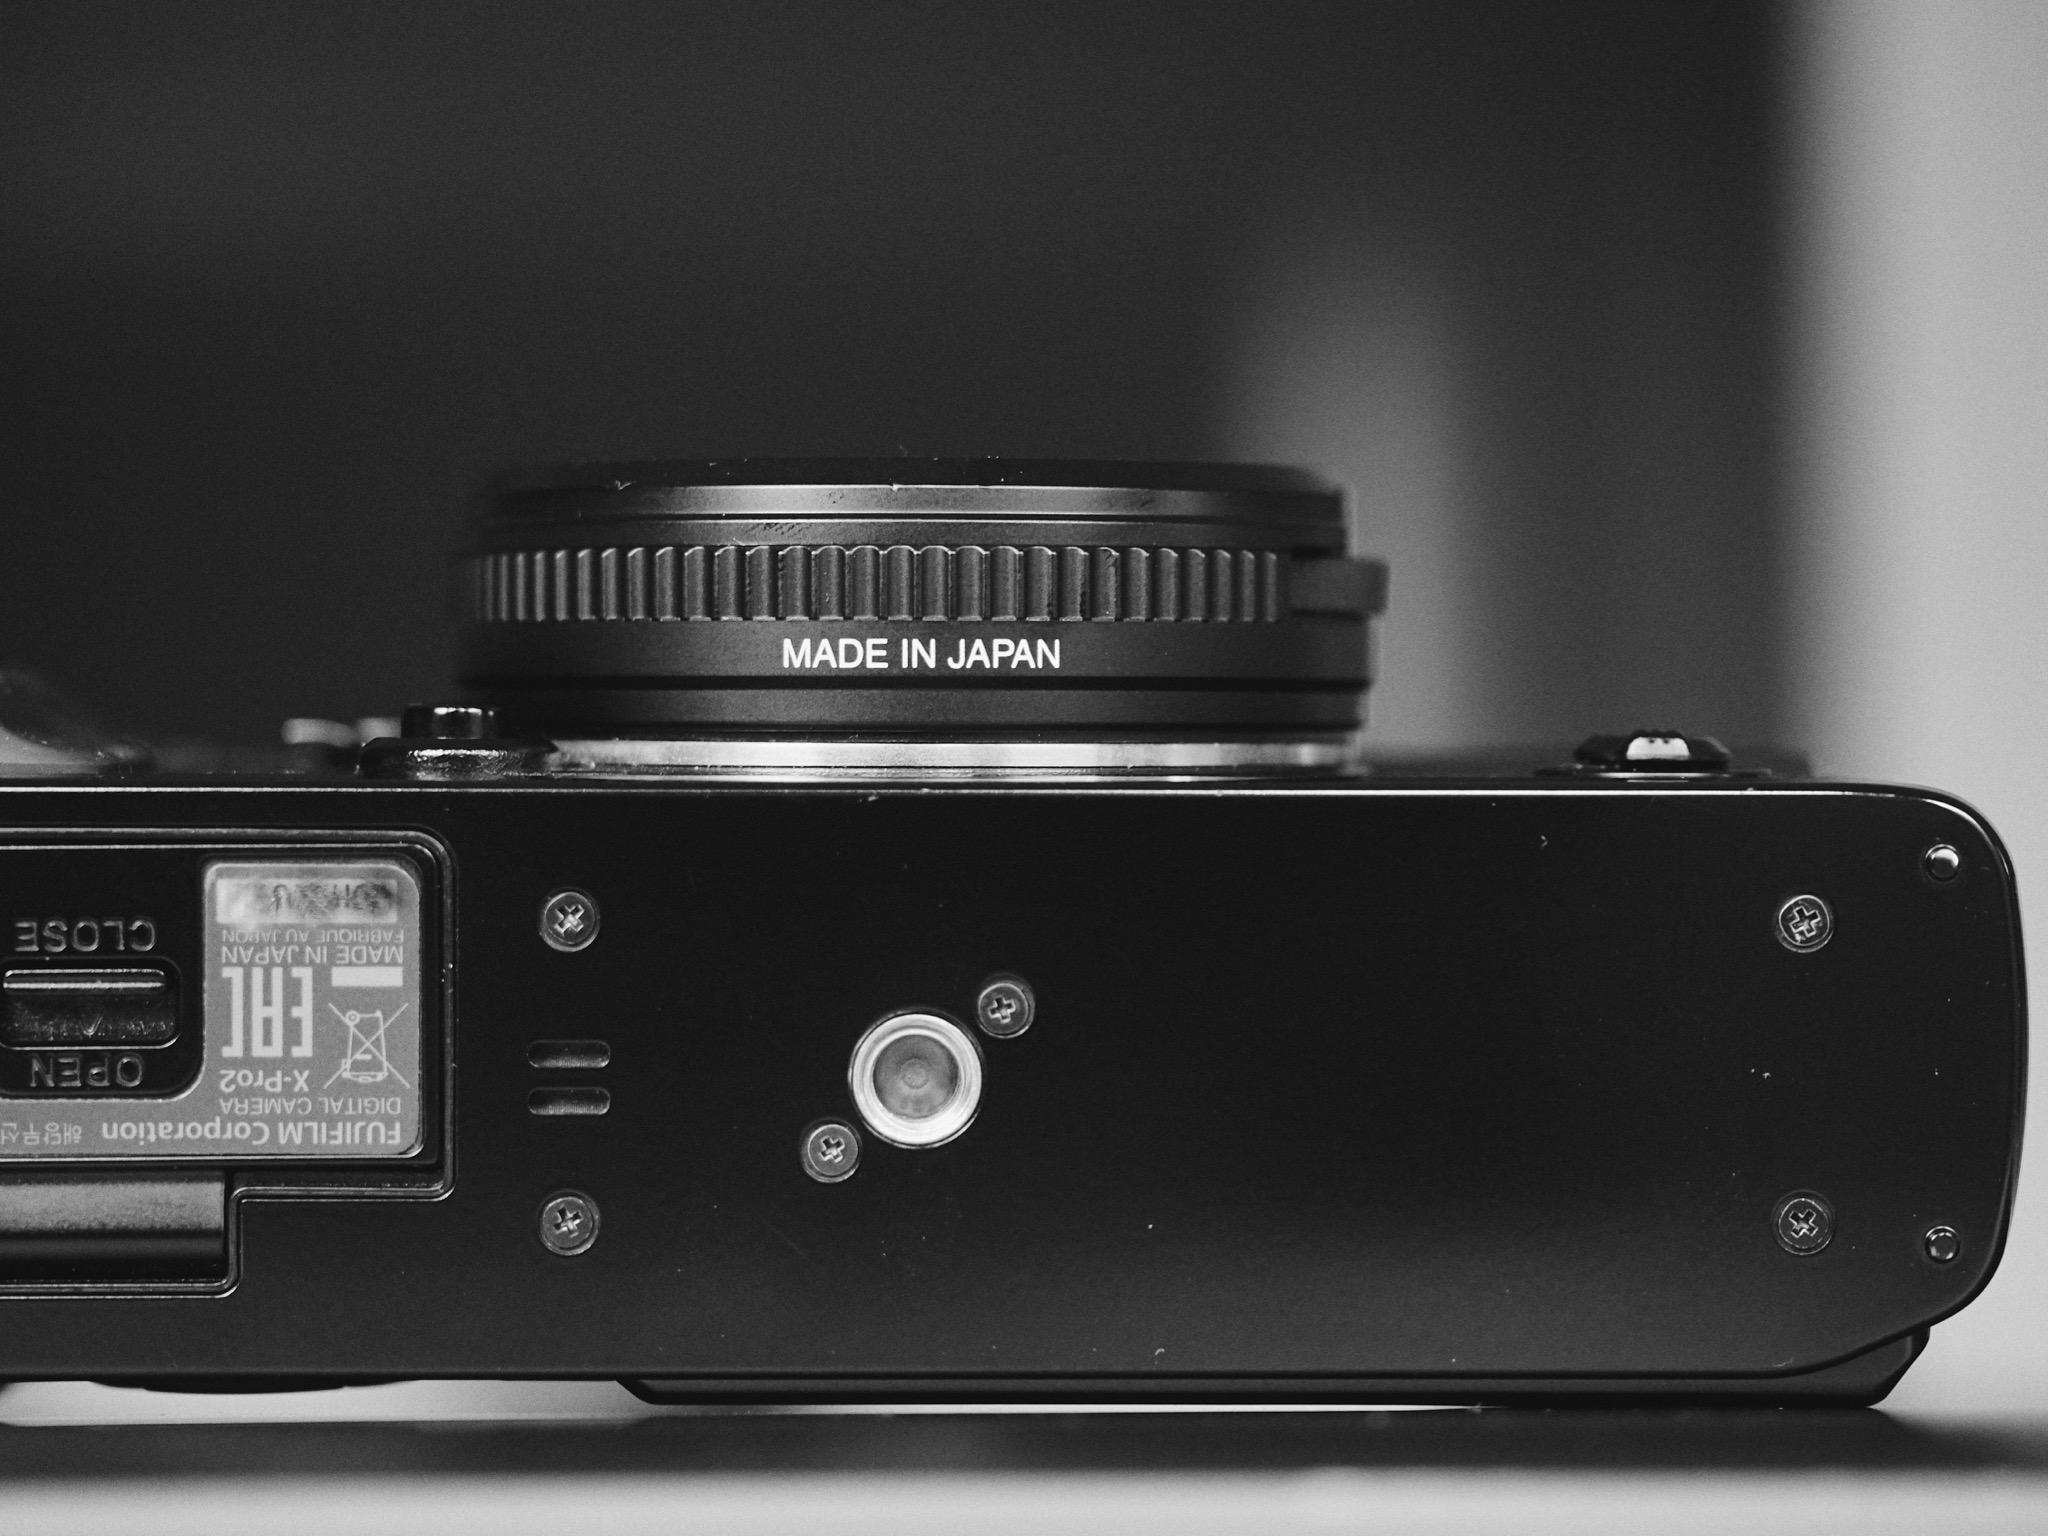 Best Fuji Lens for Street Photography - 24mm F8 Body Cap